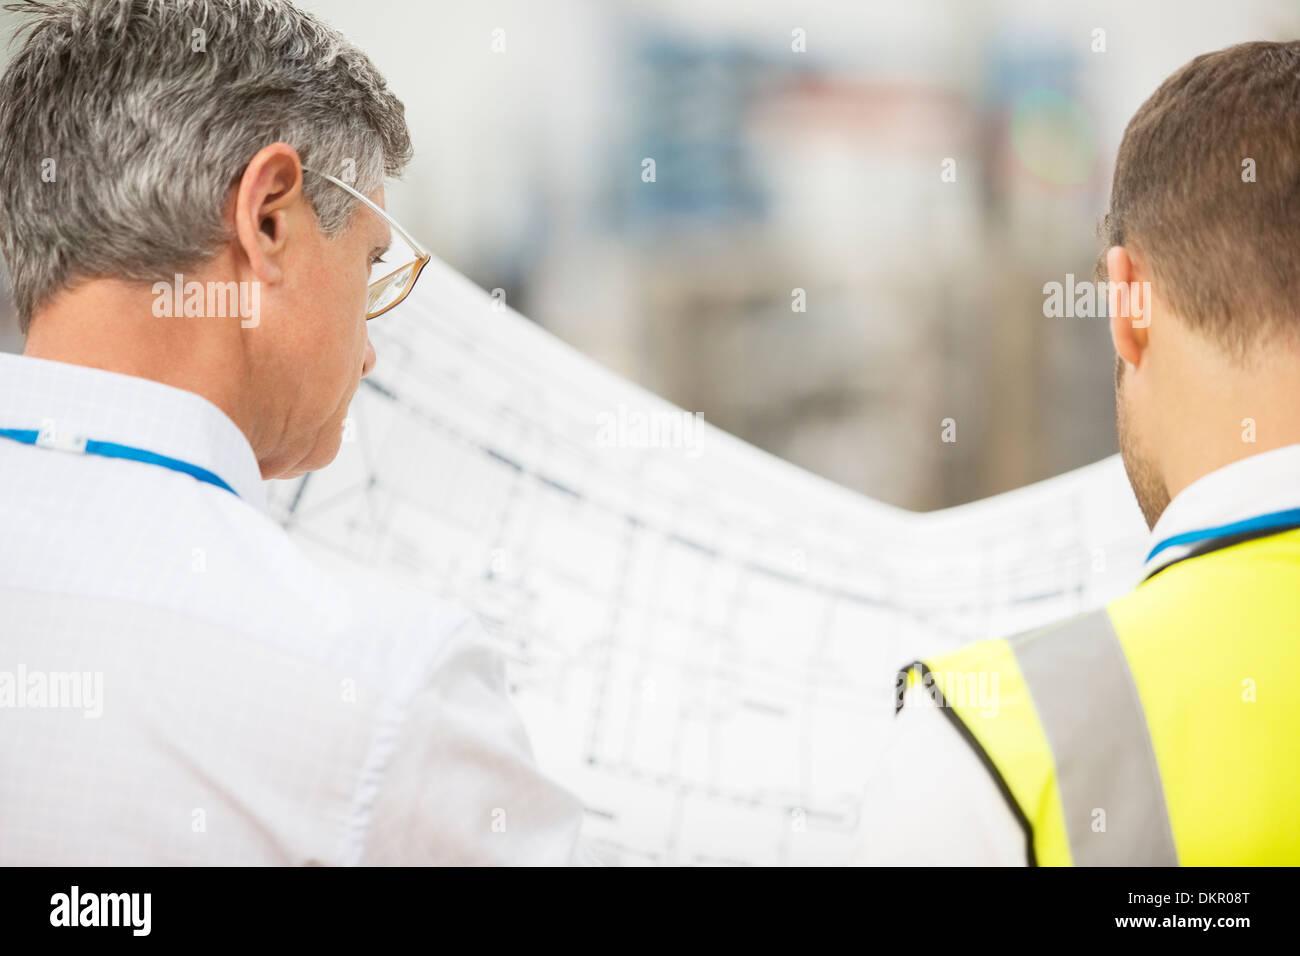 reading blueprints